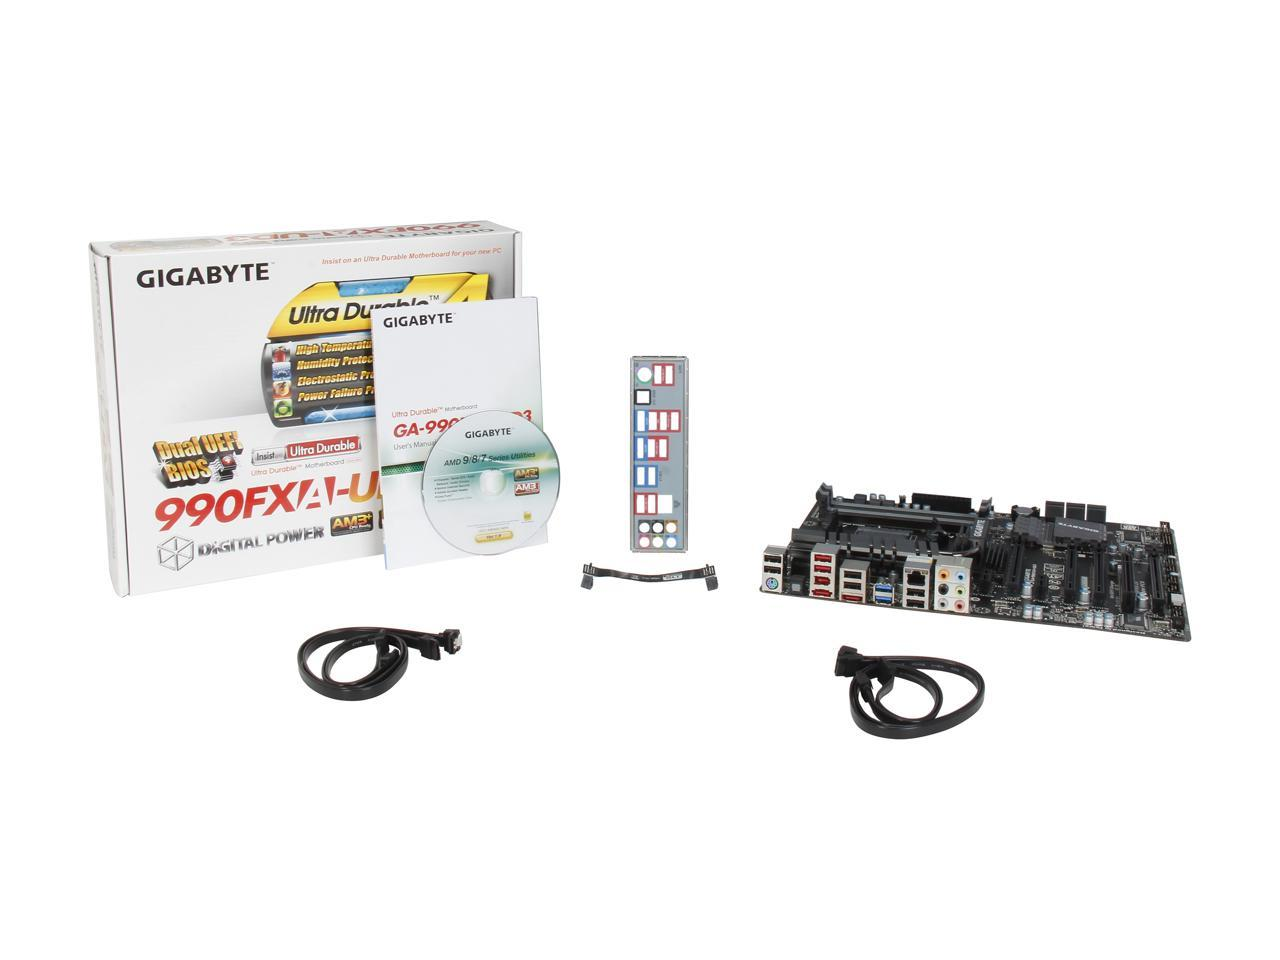 Gigabyte Motherboard Ga 990fxa Ud3 Am3 Amd 990fx Sb950